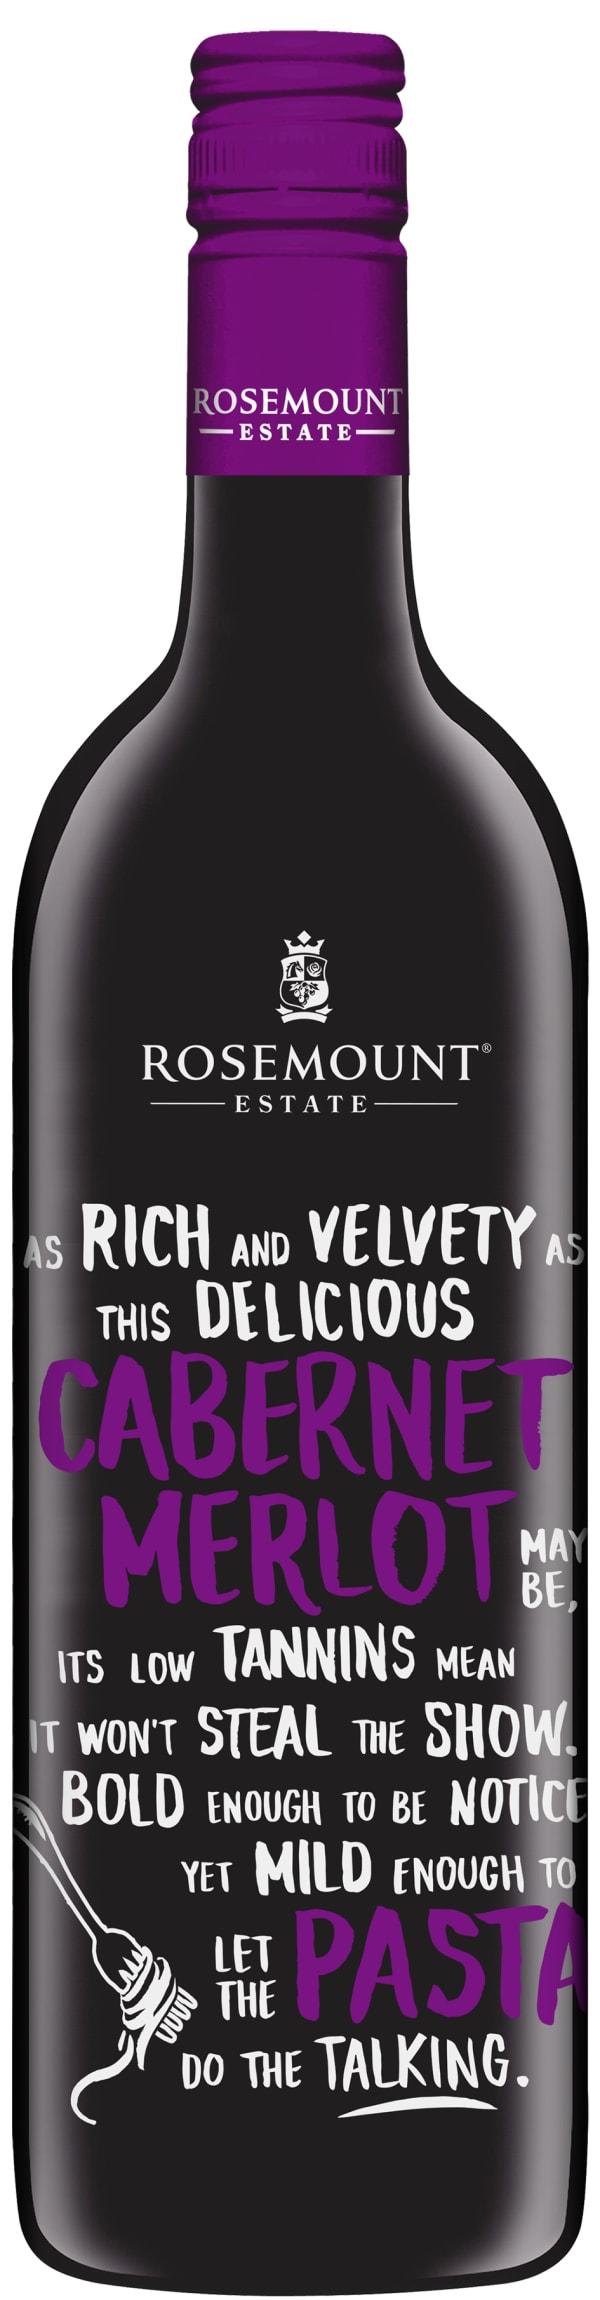 Rosemount Pasta Cabernet Merlot 2016